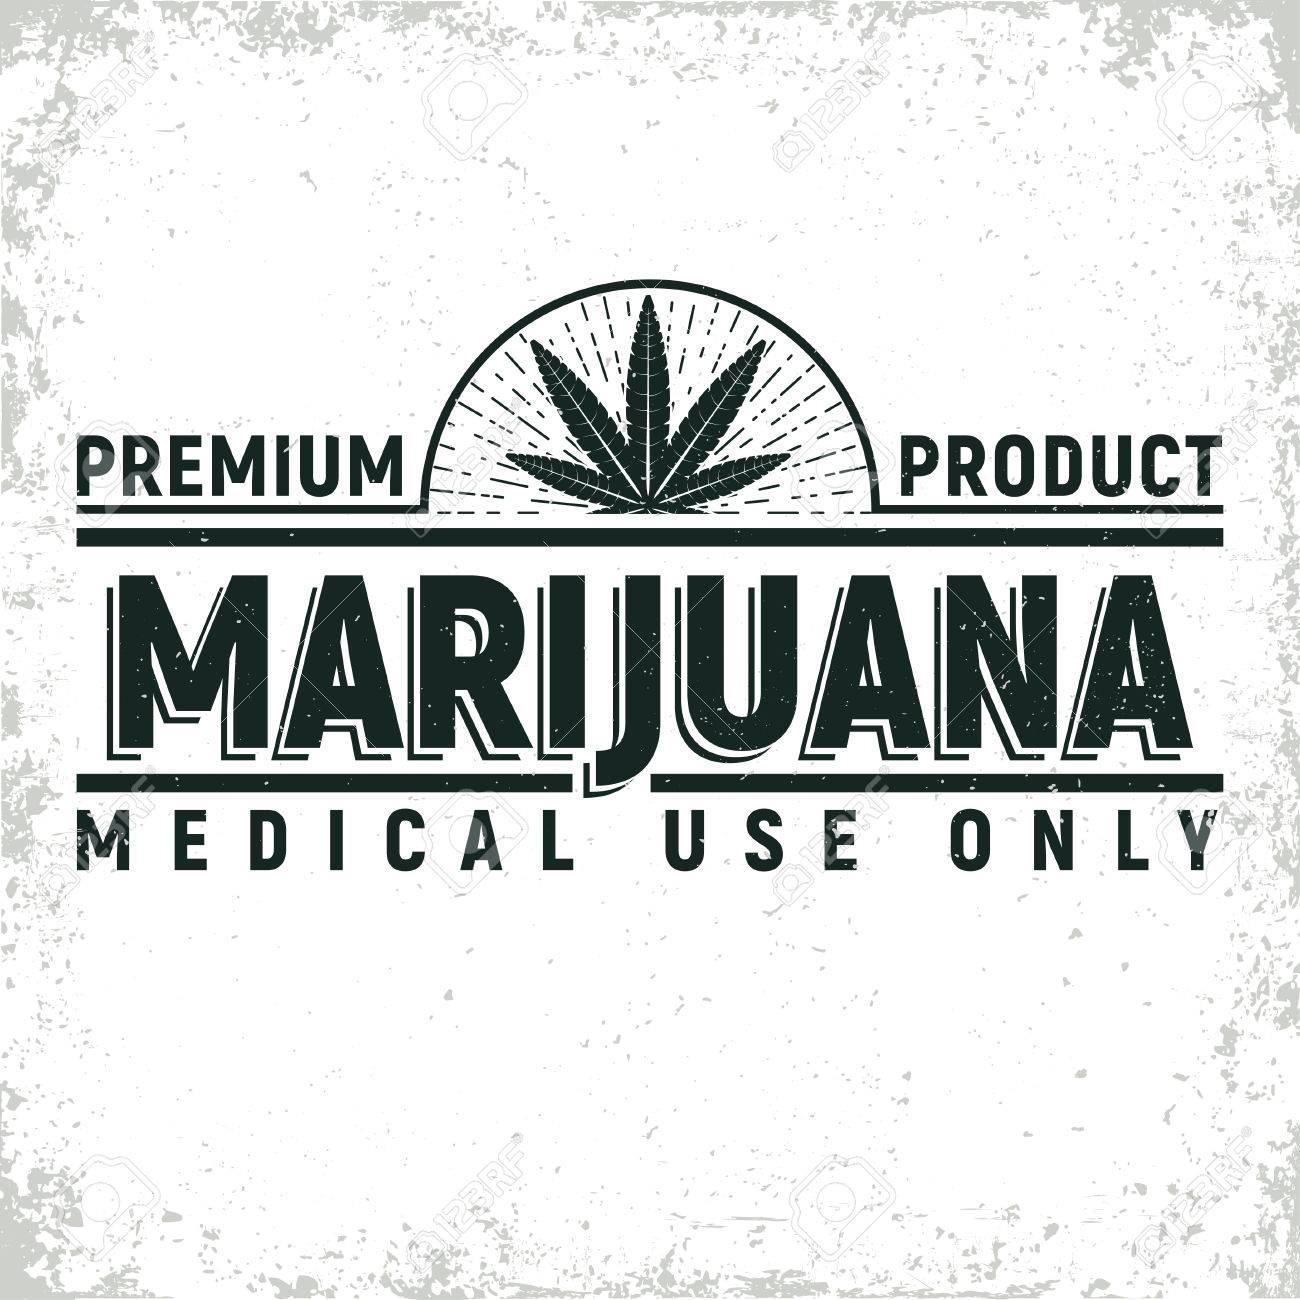 Vintage medical cannabis logo design, grange print stamp, creative marijuana typography emblem, Vector - 78687699